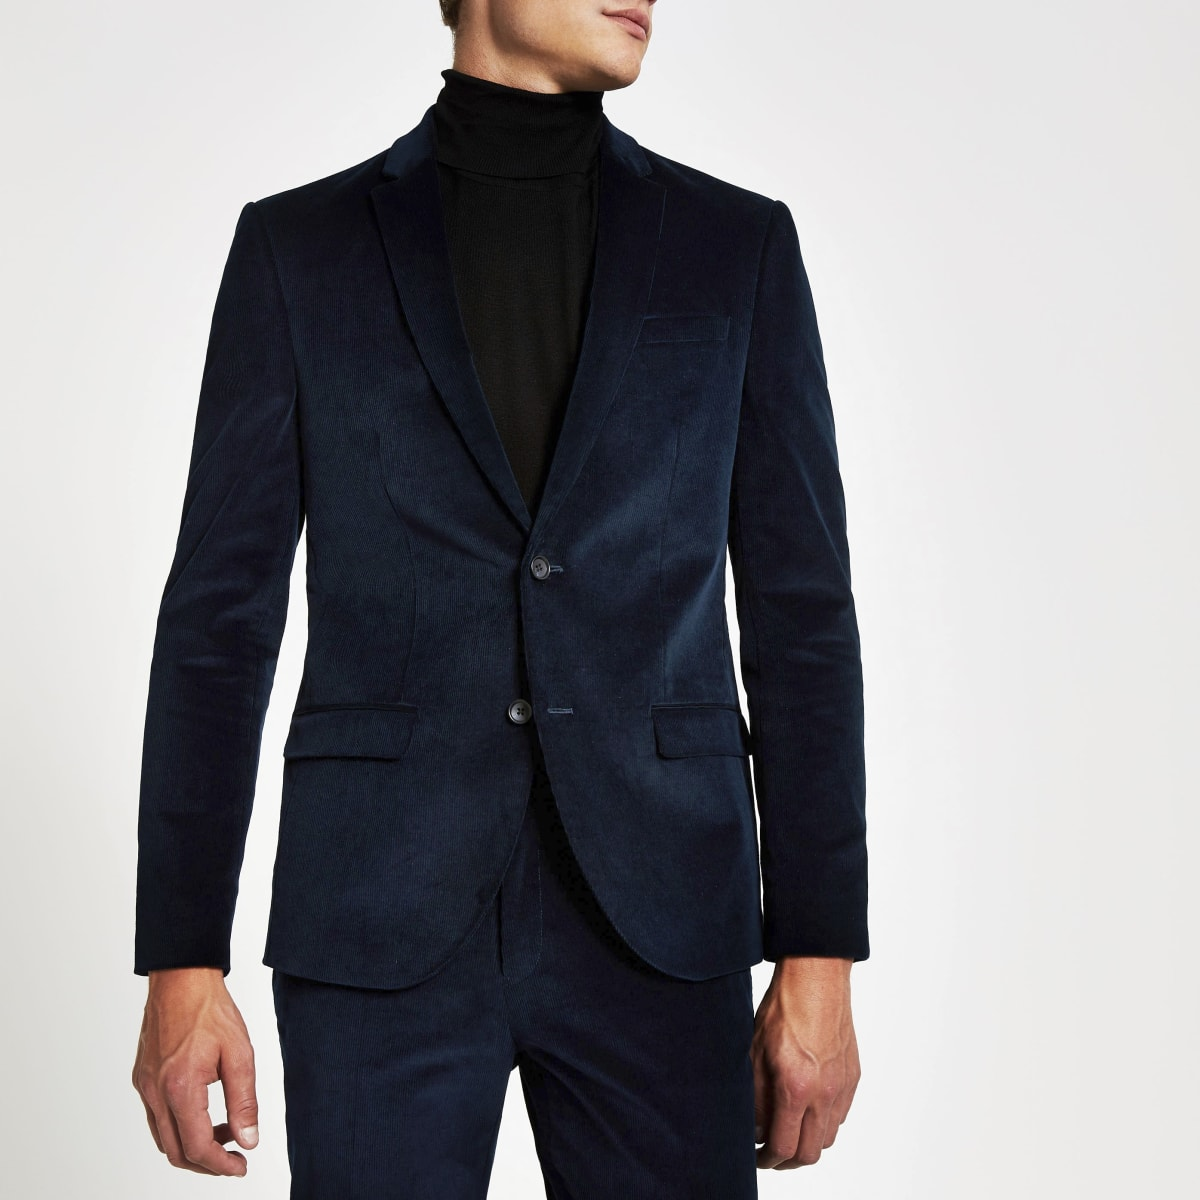 Costume bleu en velours coupe skinny.